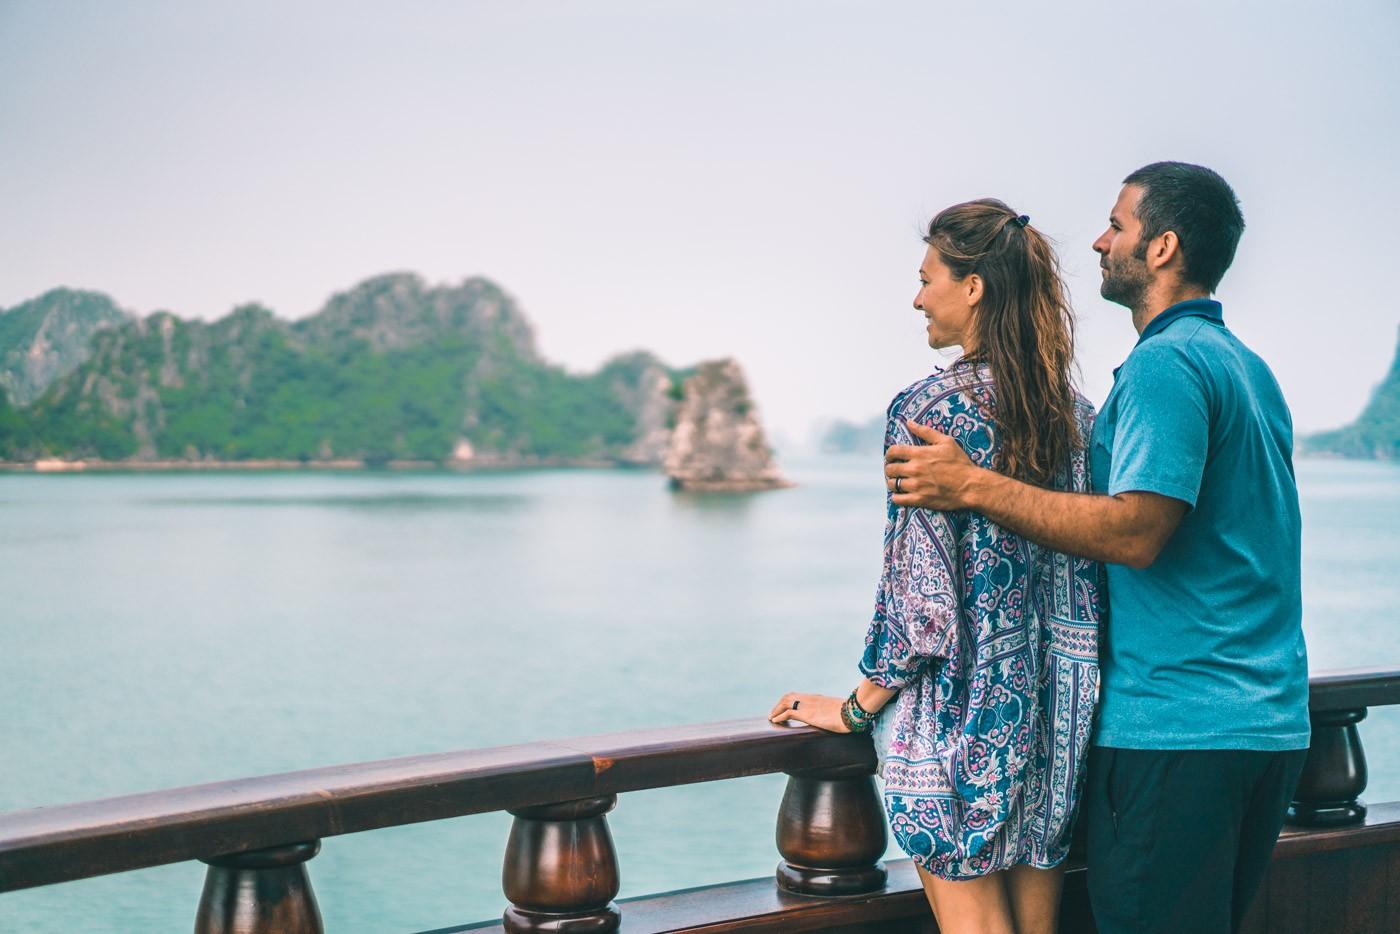 Halong Bay Cruise: Oksana & Max enjoying the scenery of Bai Tu Long Bay on Dragon Legend Cruise